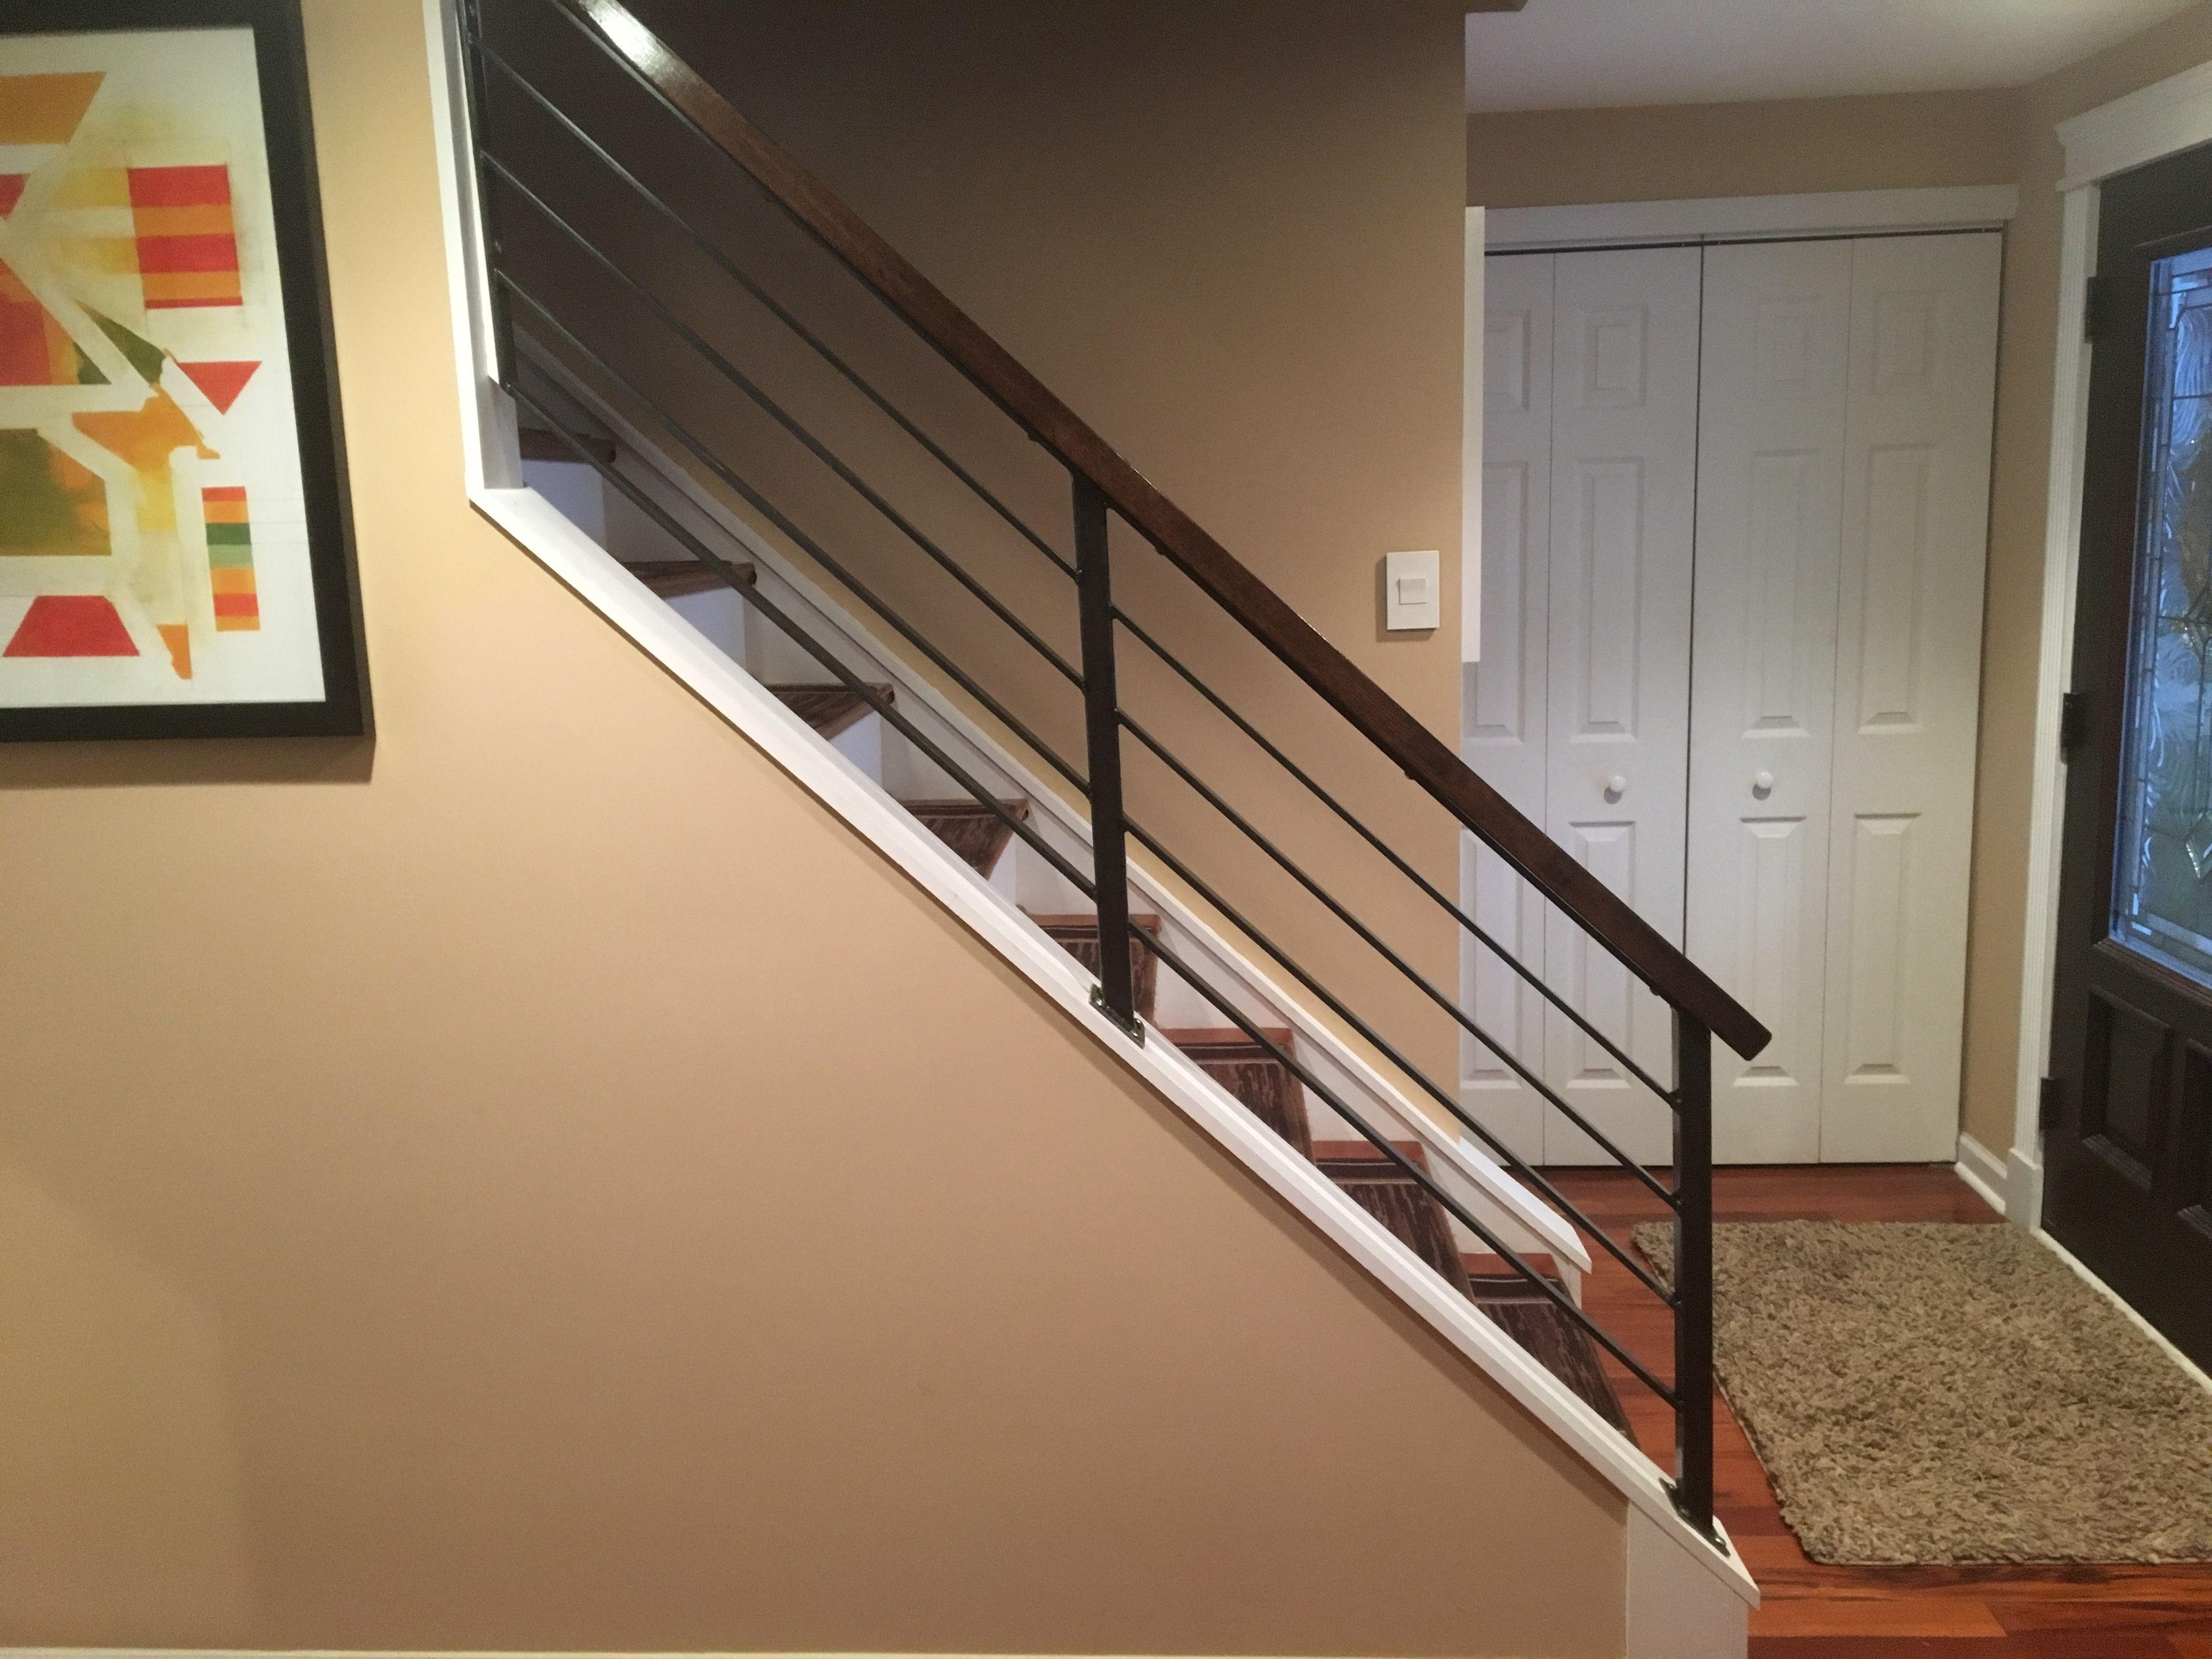 Custom Made Horizontal Slat Railing Indoor Stair Railing   Horizontal Iron Stair Railing   Chris Loves   Modern   Popular   Low Cost   Remodel